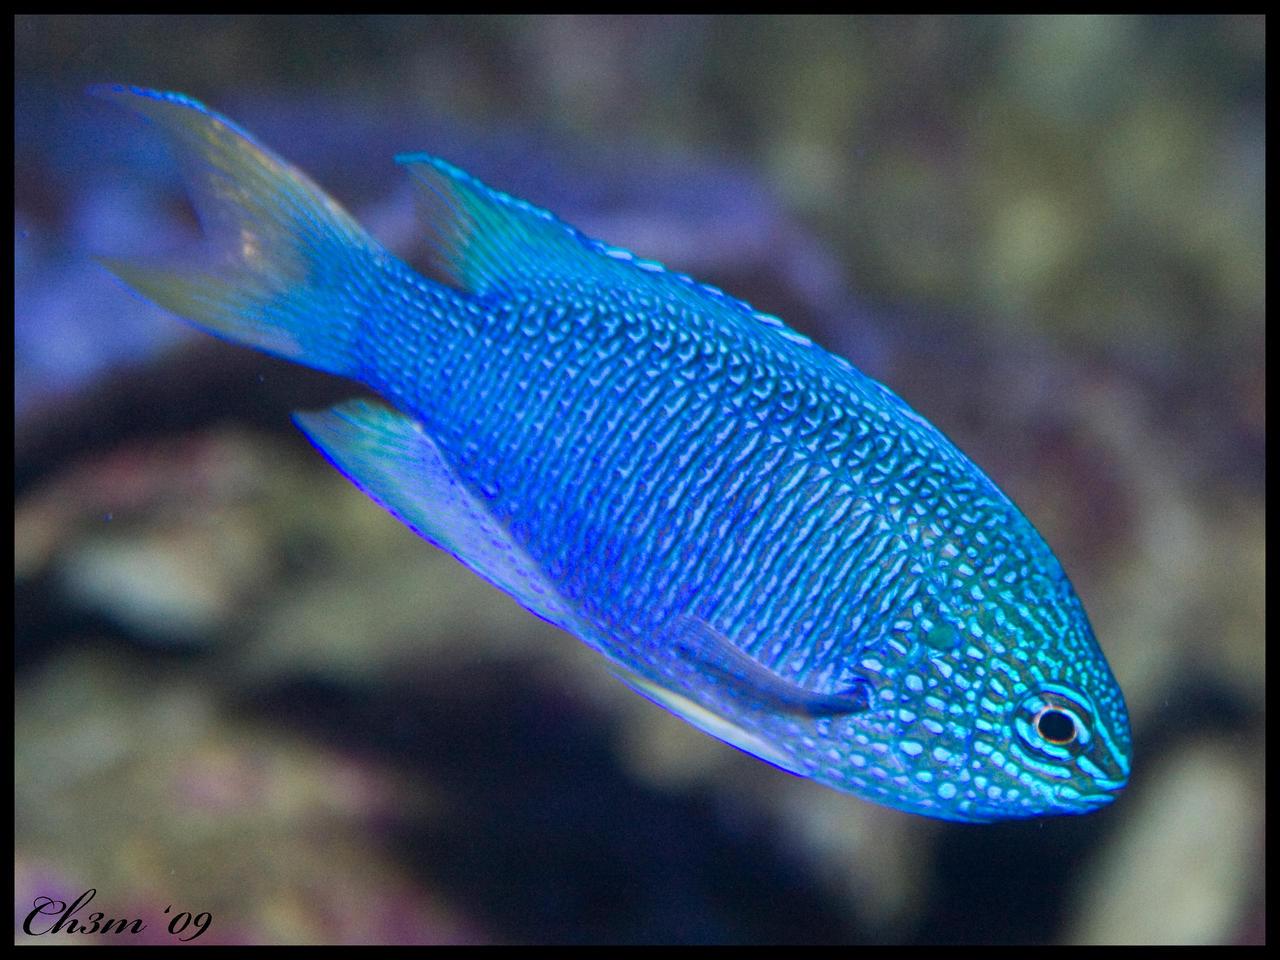 Christian speed dating blue fish